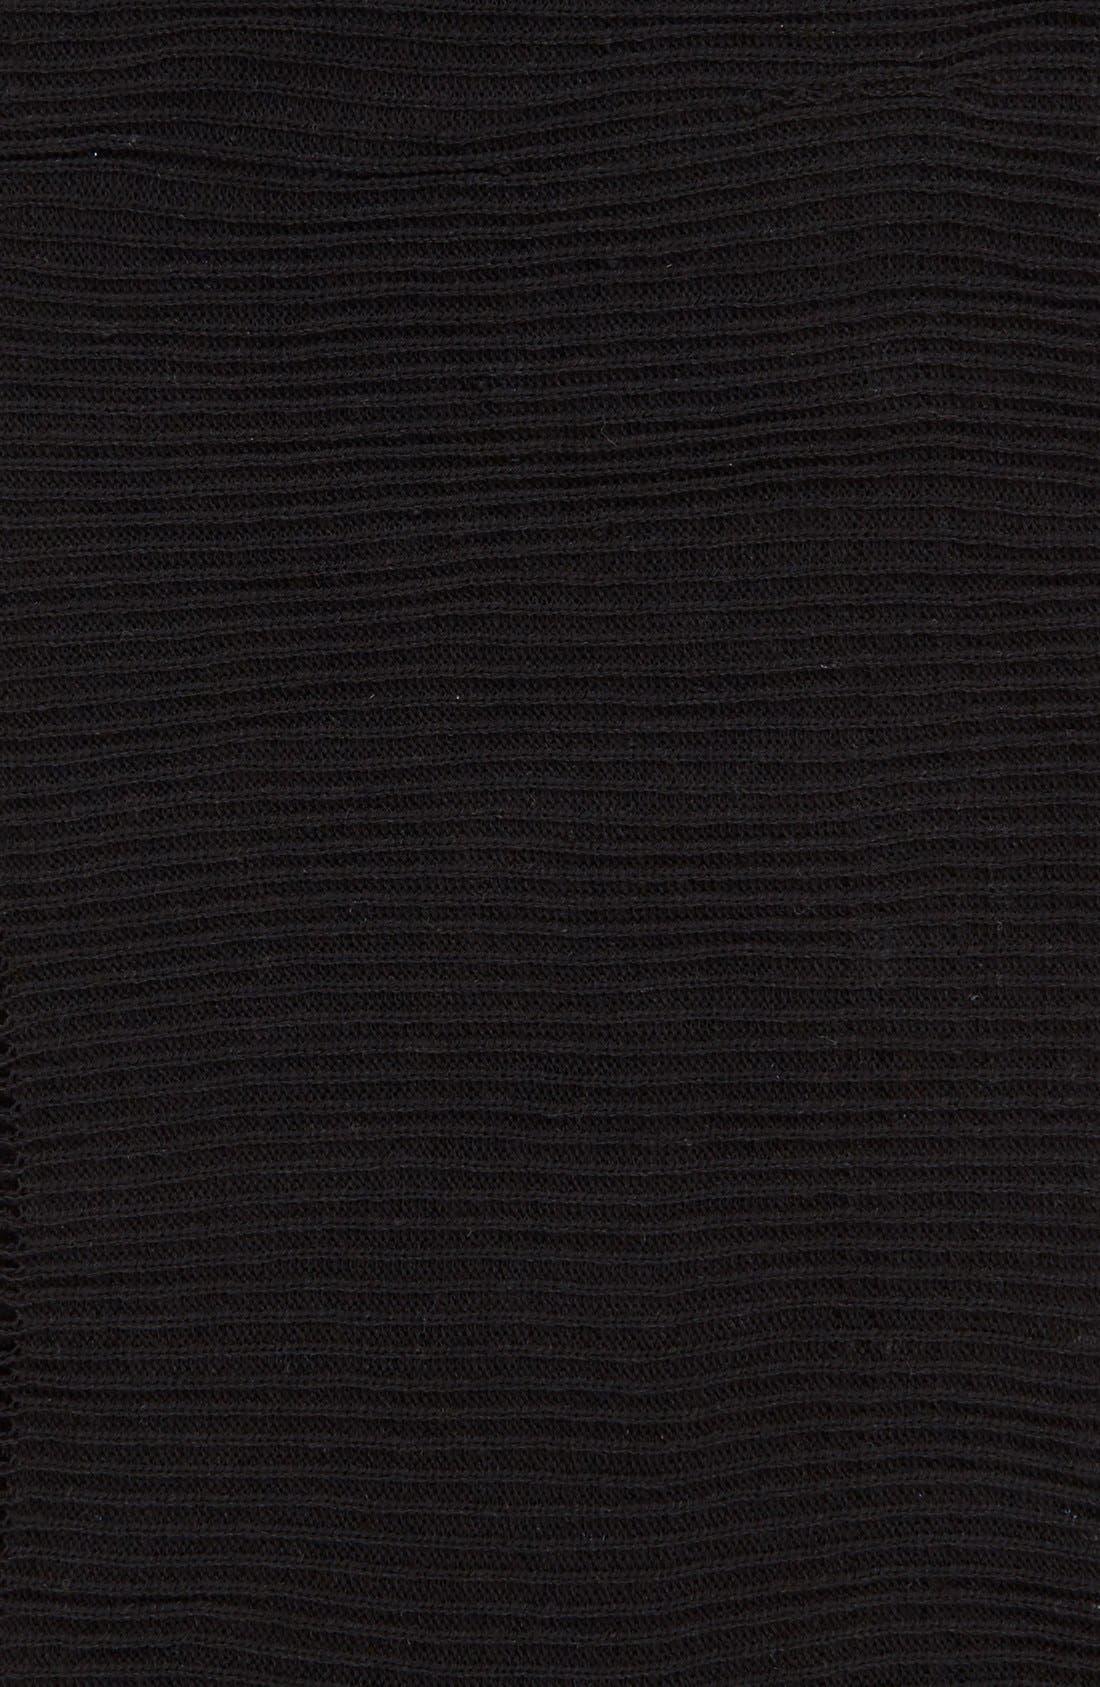 Rib Knit Fringe Infinity Scarf,                             Alternate thumbnail 7, color,